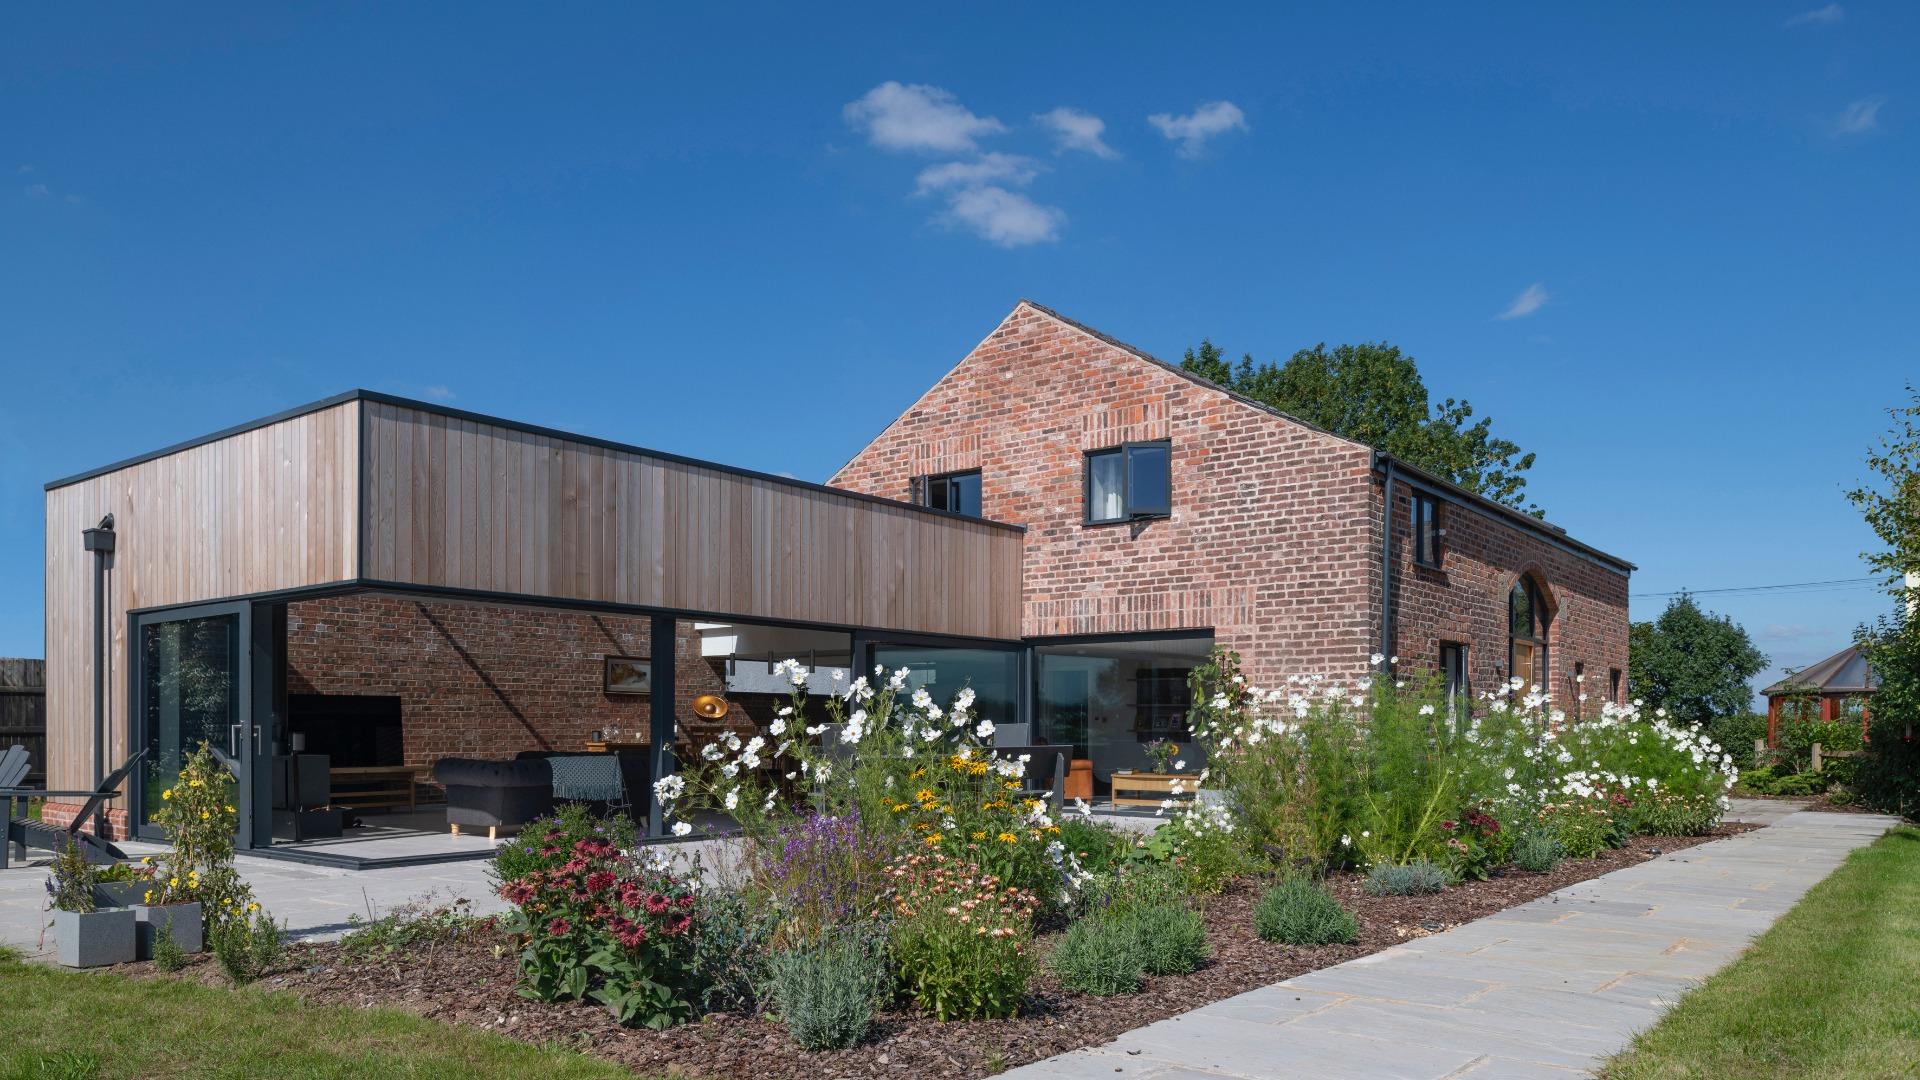 Woodplumpton barn conversion - a Stanton Andrews project